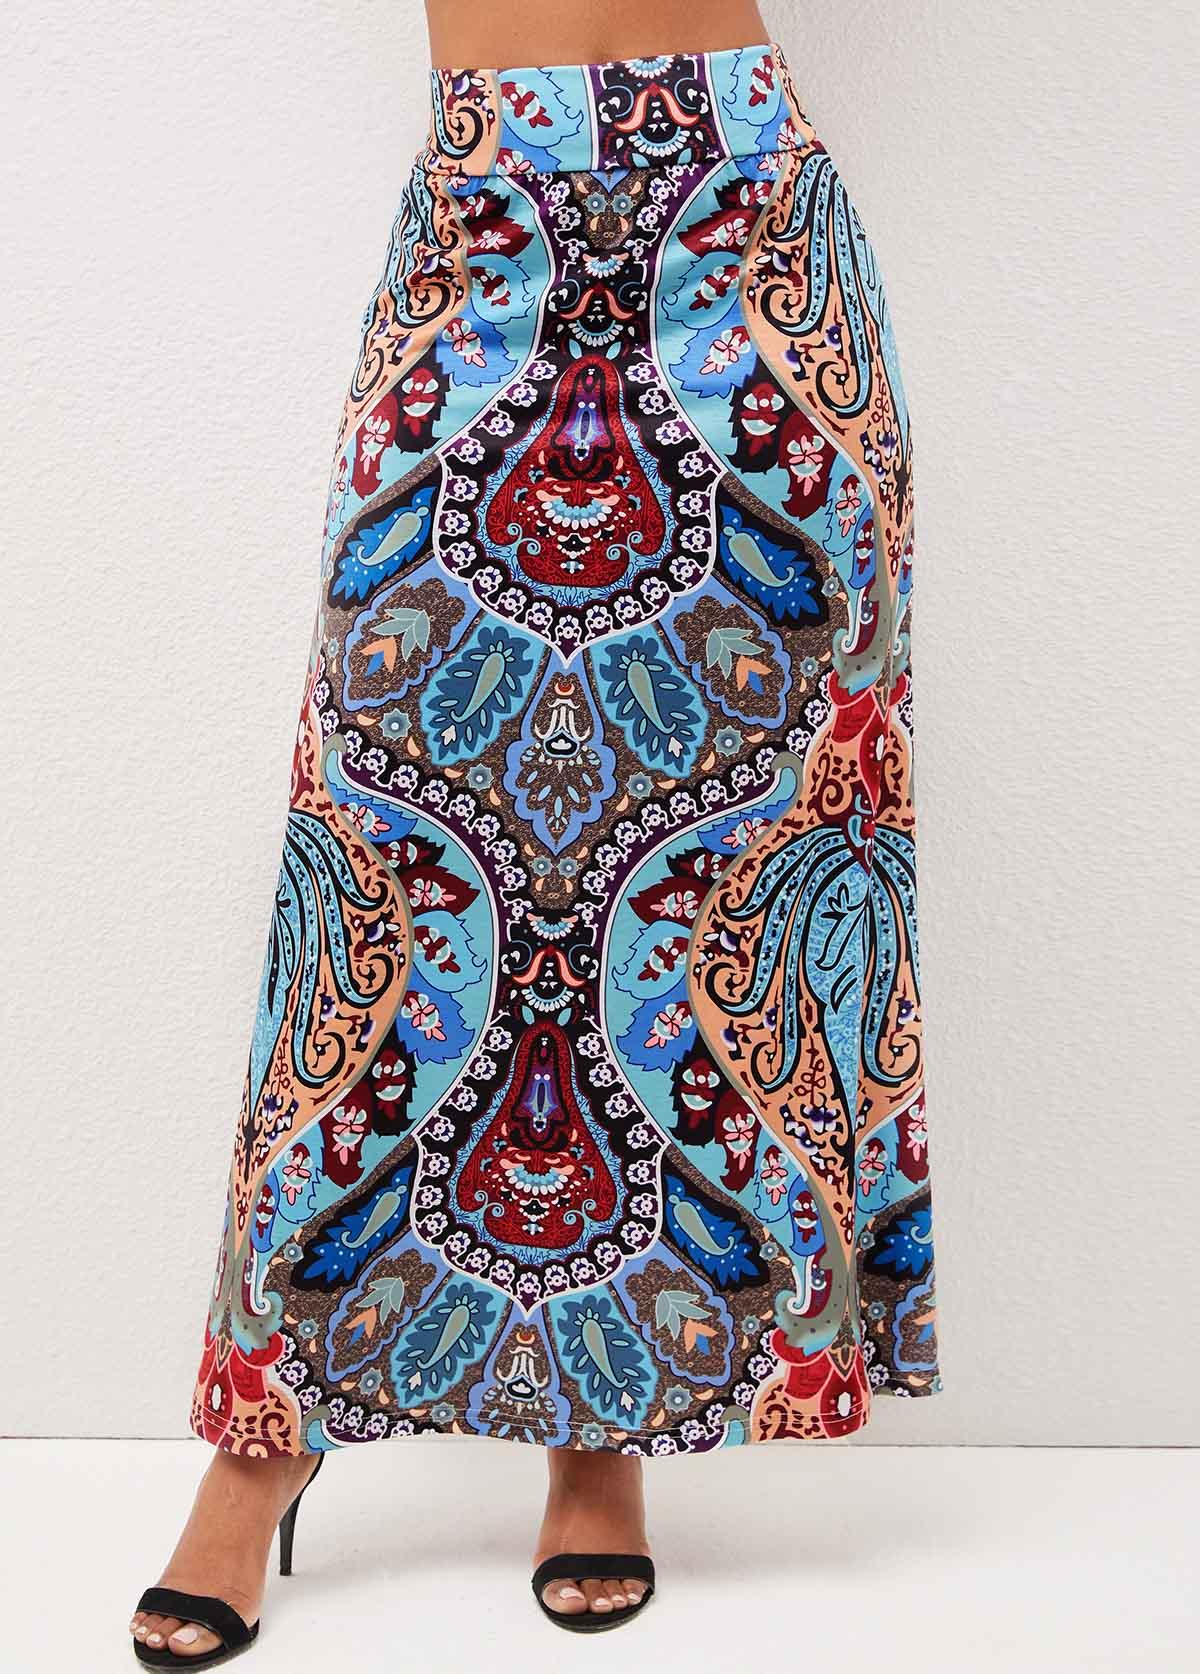 High Waist Tribal Print Multi Color Skirt